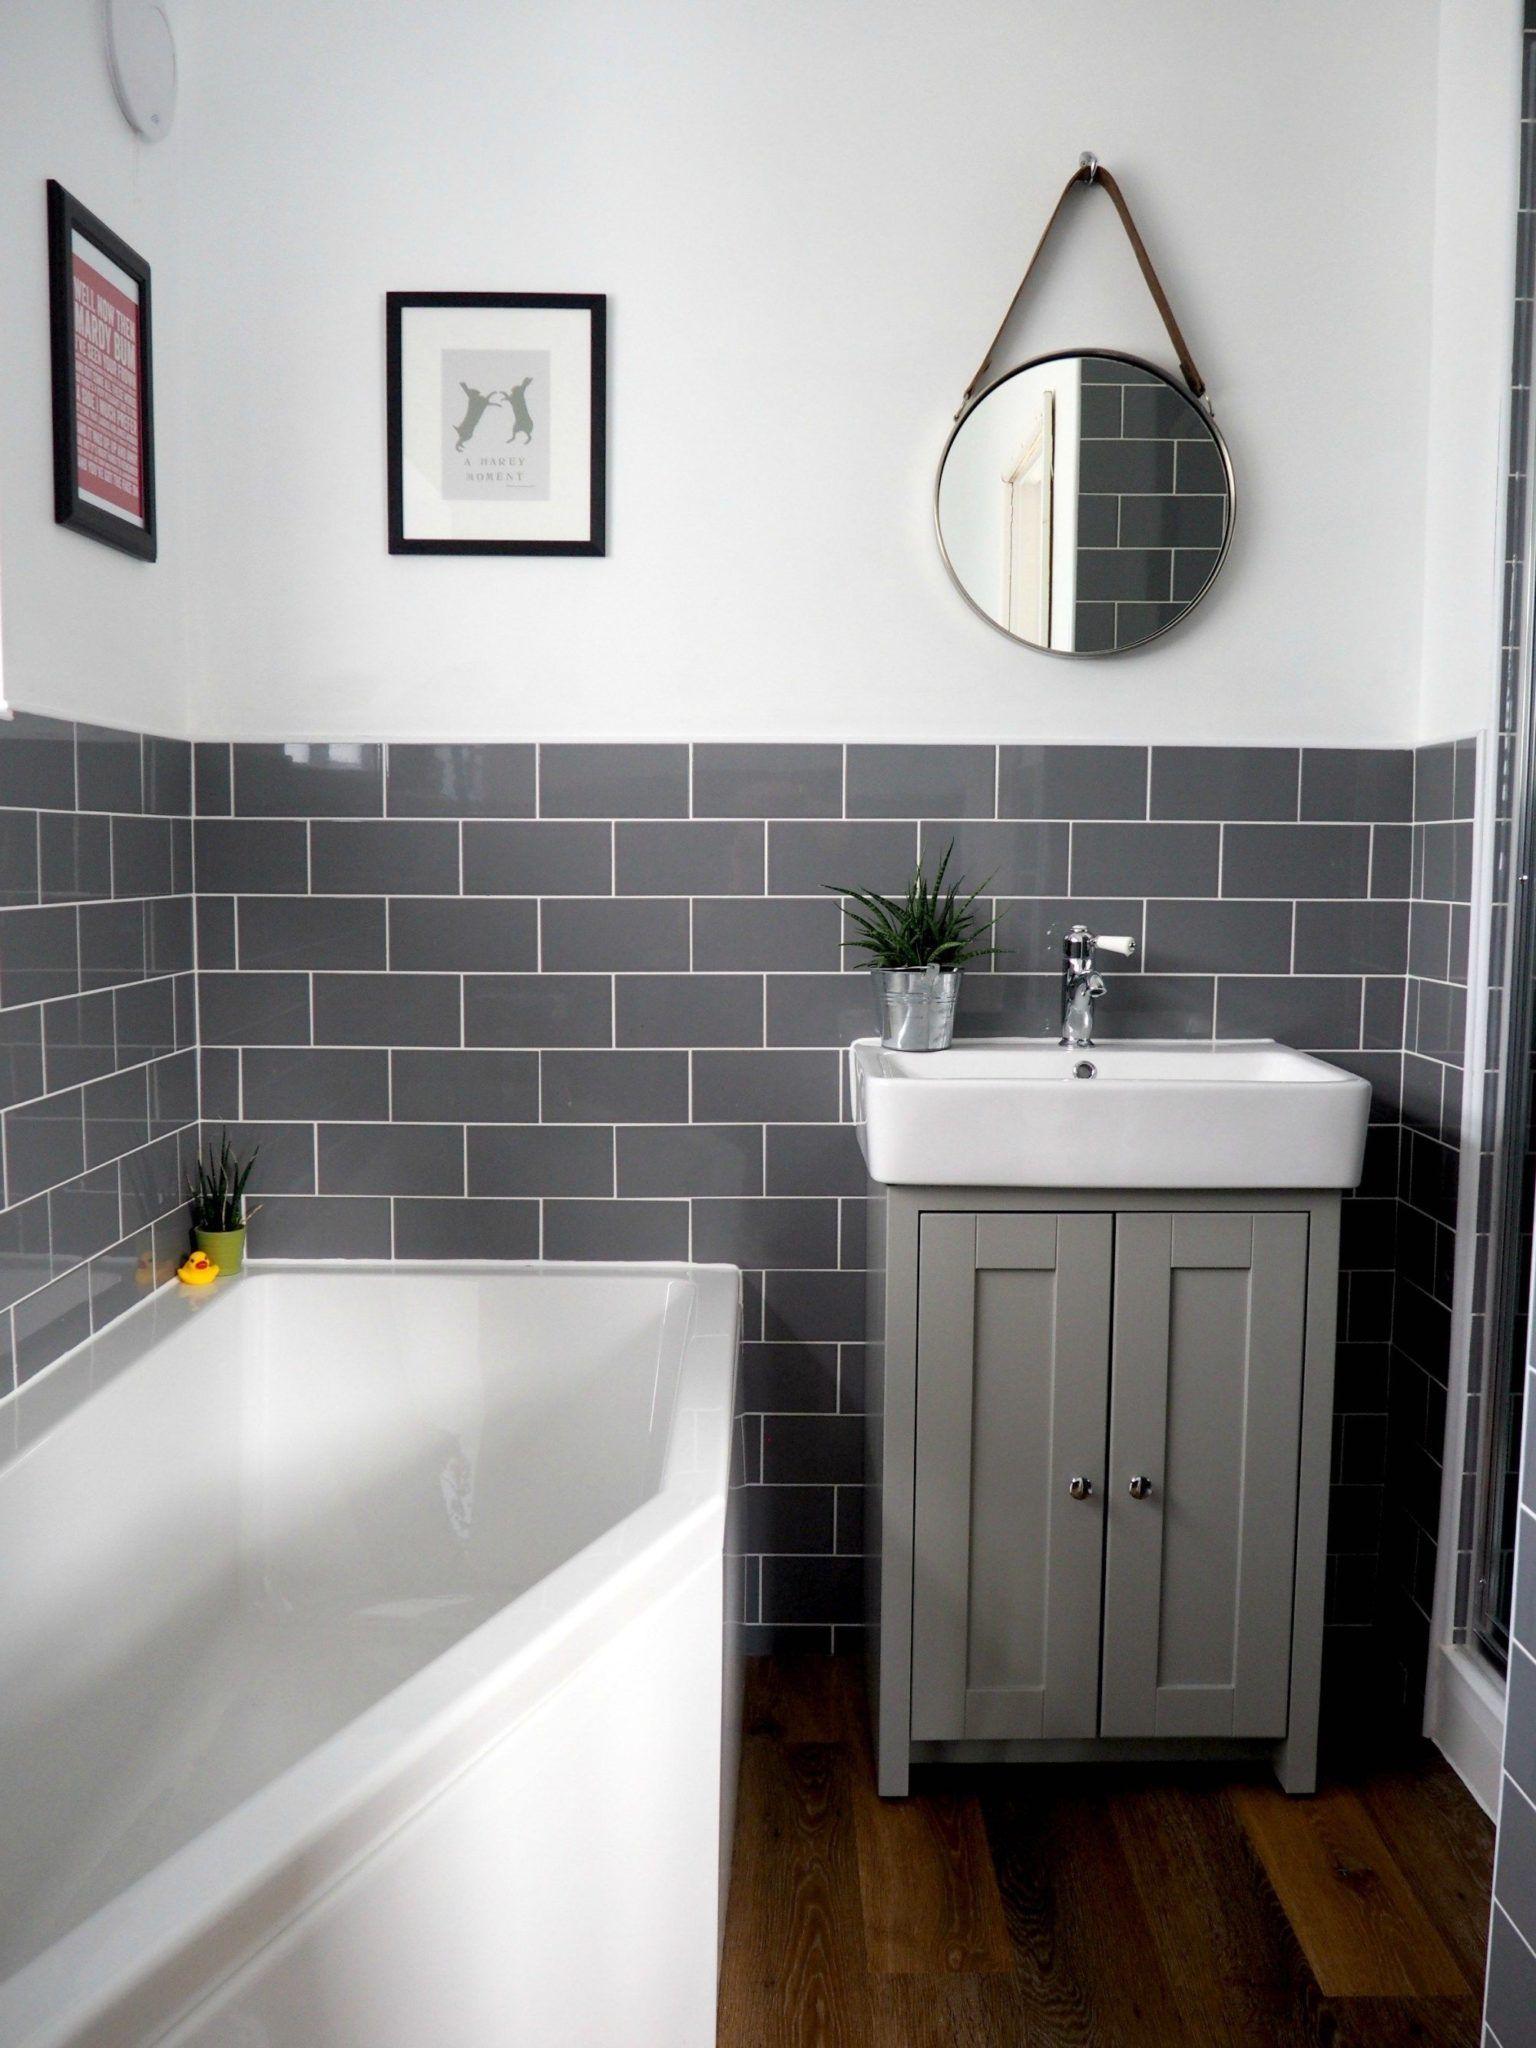 Bathroom Design Ideas For Small Spaces In India Luxurybathroomtilesindia Bathroom Remodel Cost Bathroom Design Small Bathroom Design